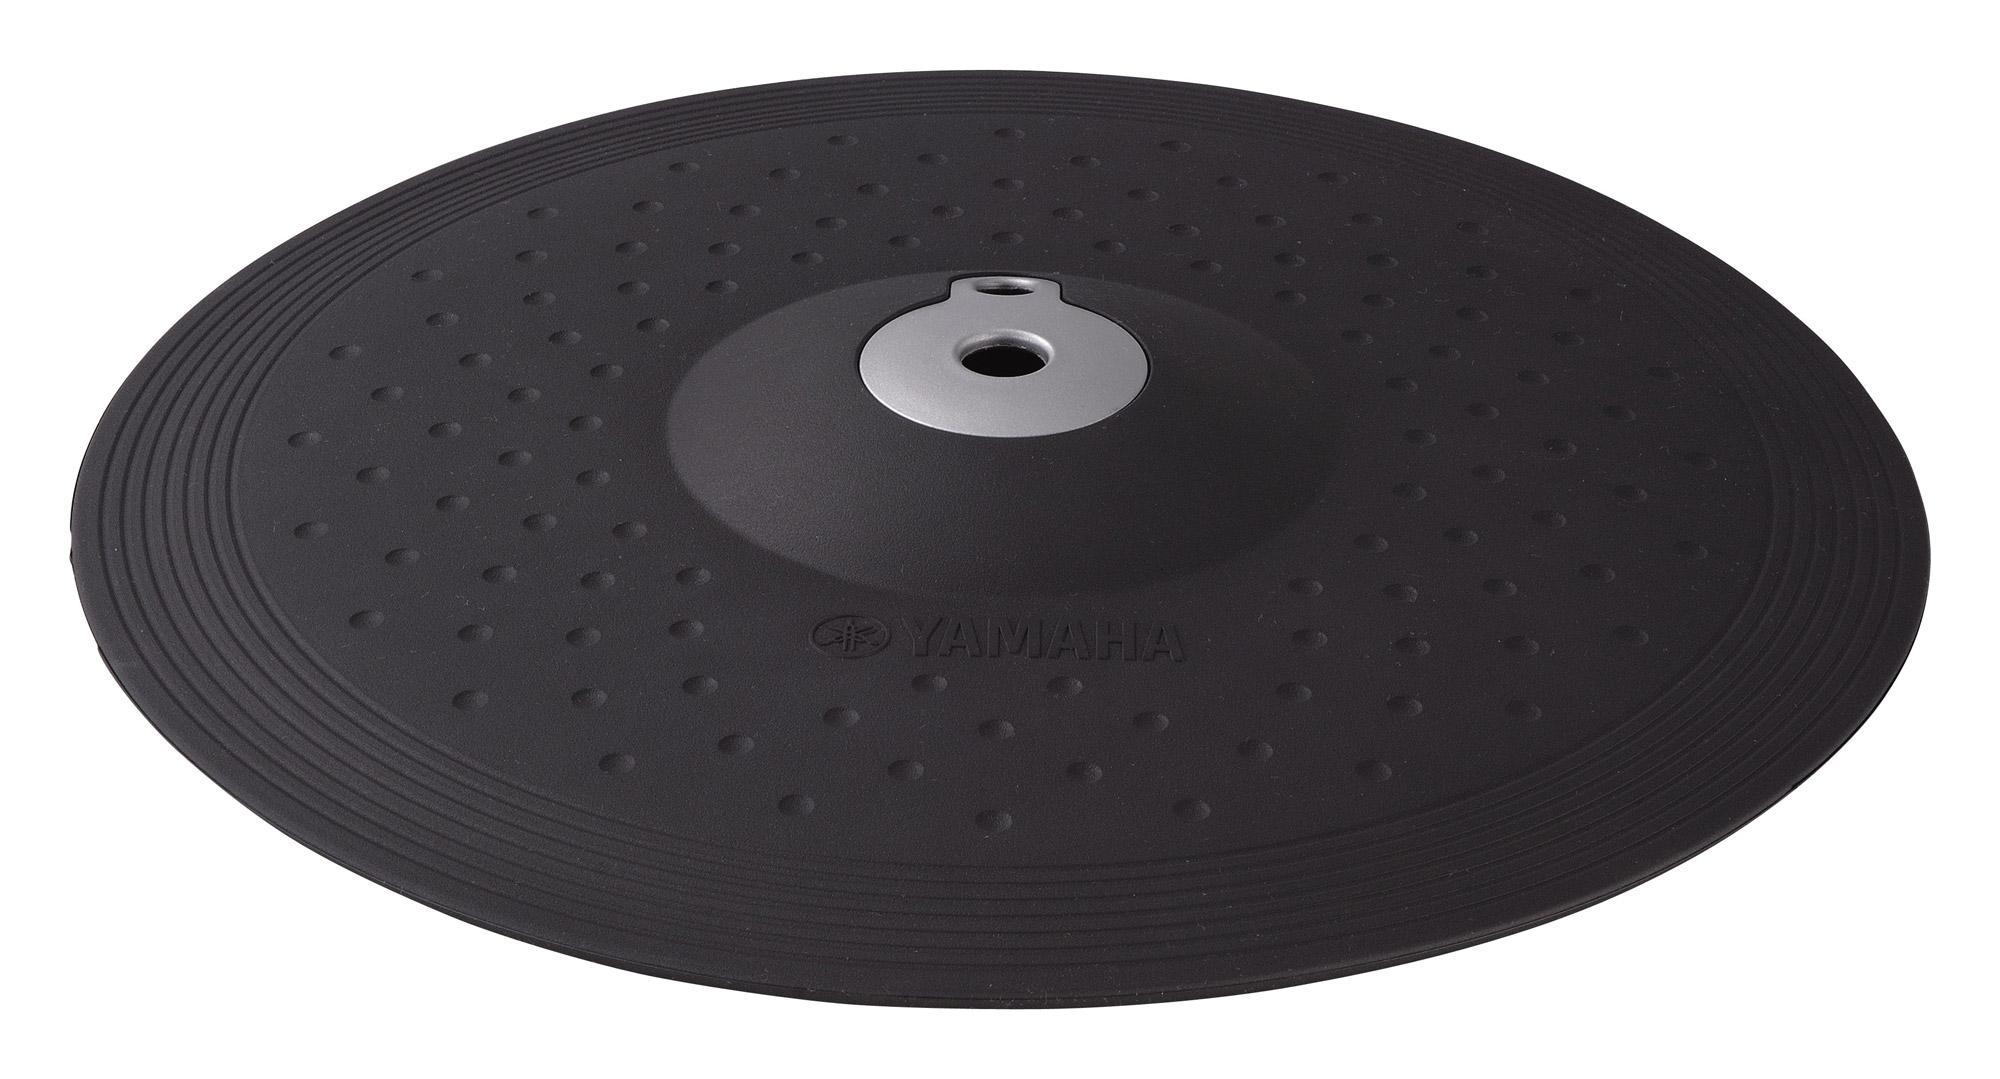 Yamaha dtx k compact e drum batteria elettronica digitale con